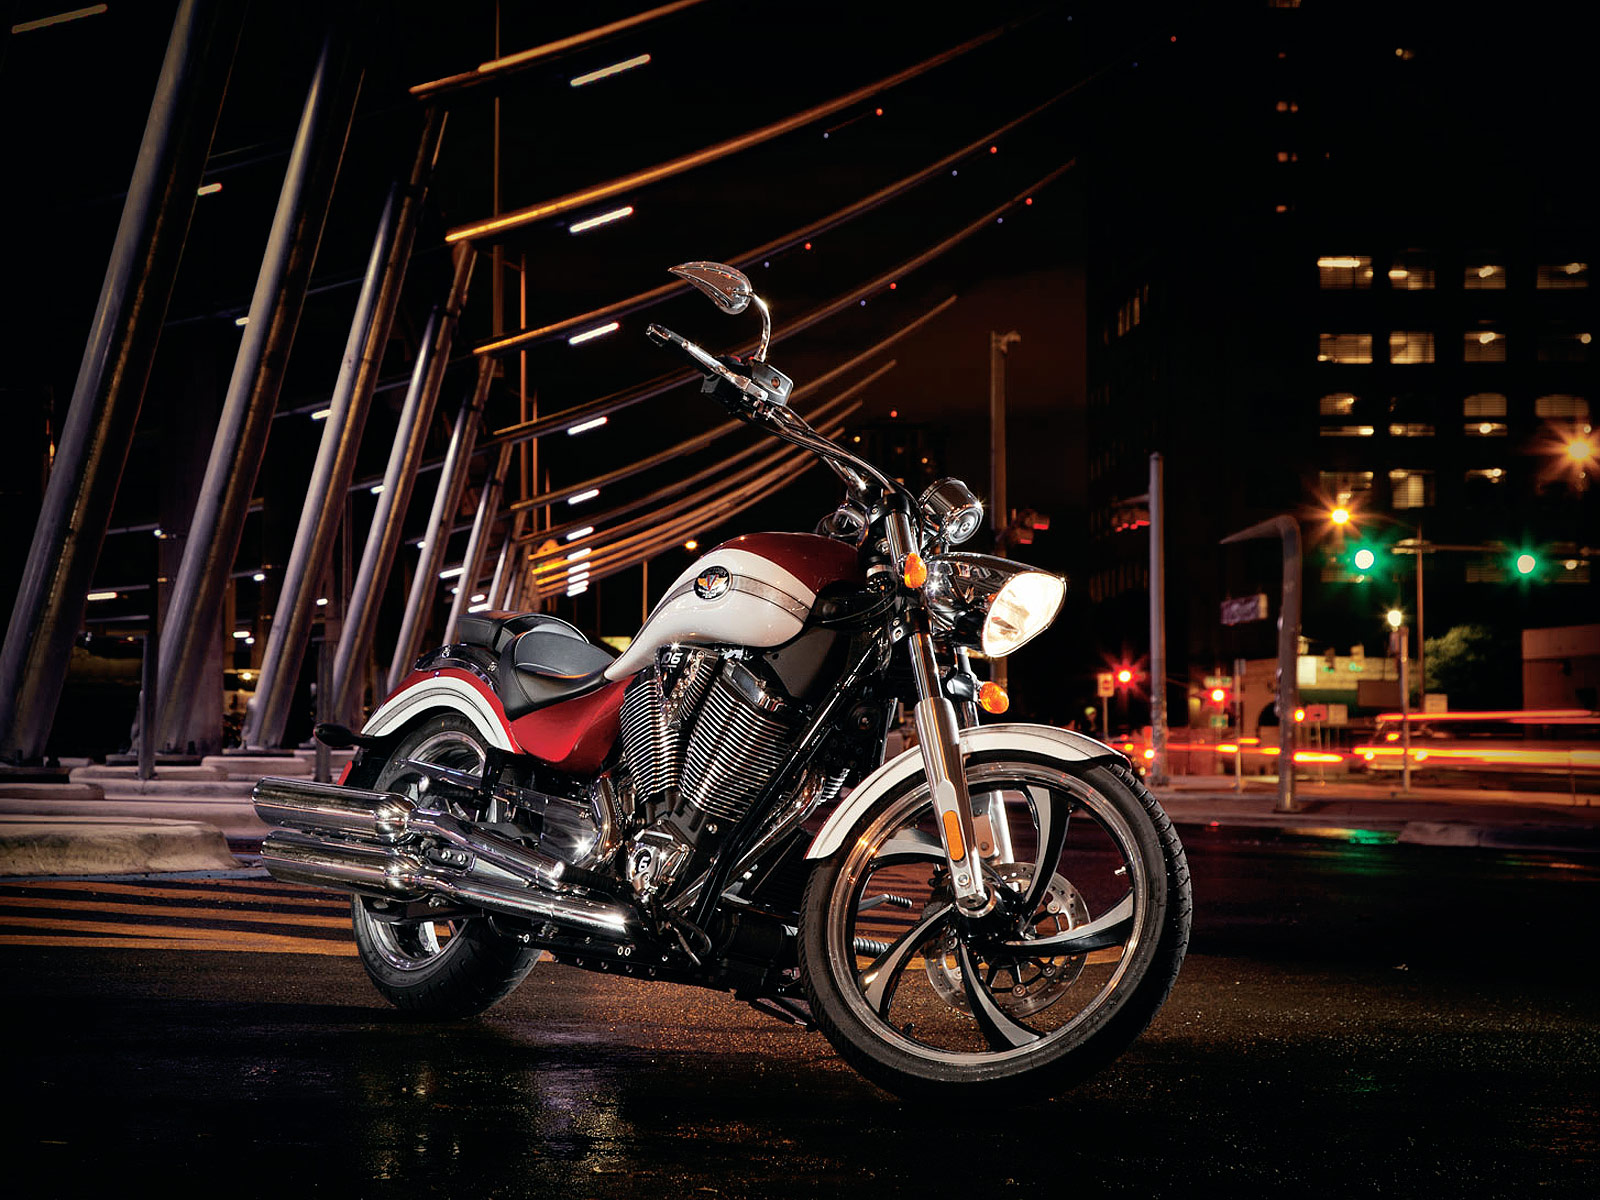 cruiser motorcycle wallpaper hd - photo #18